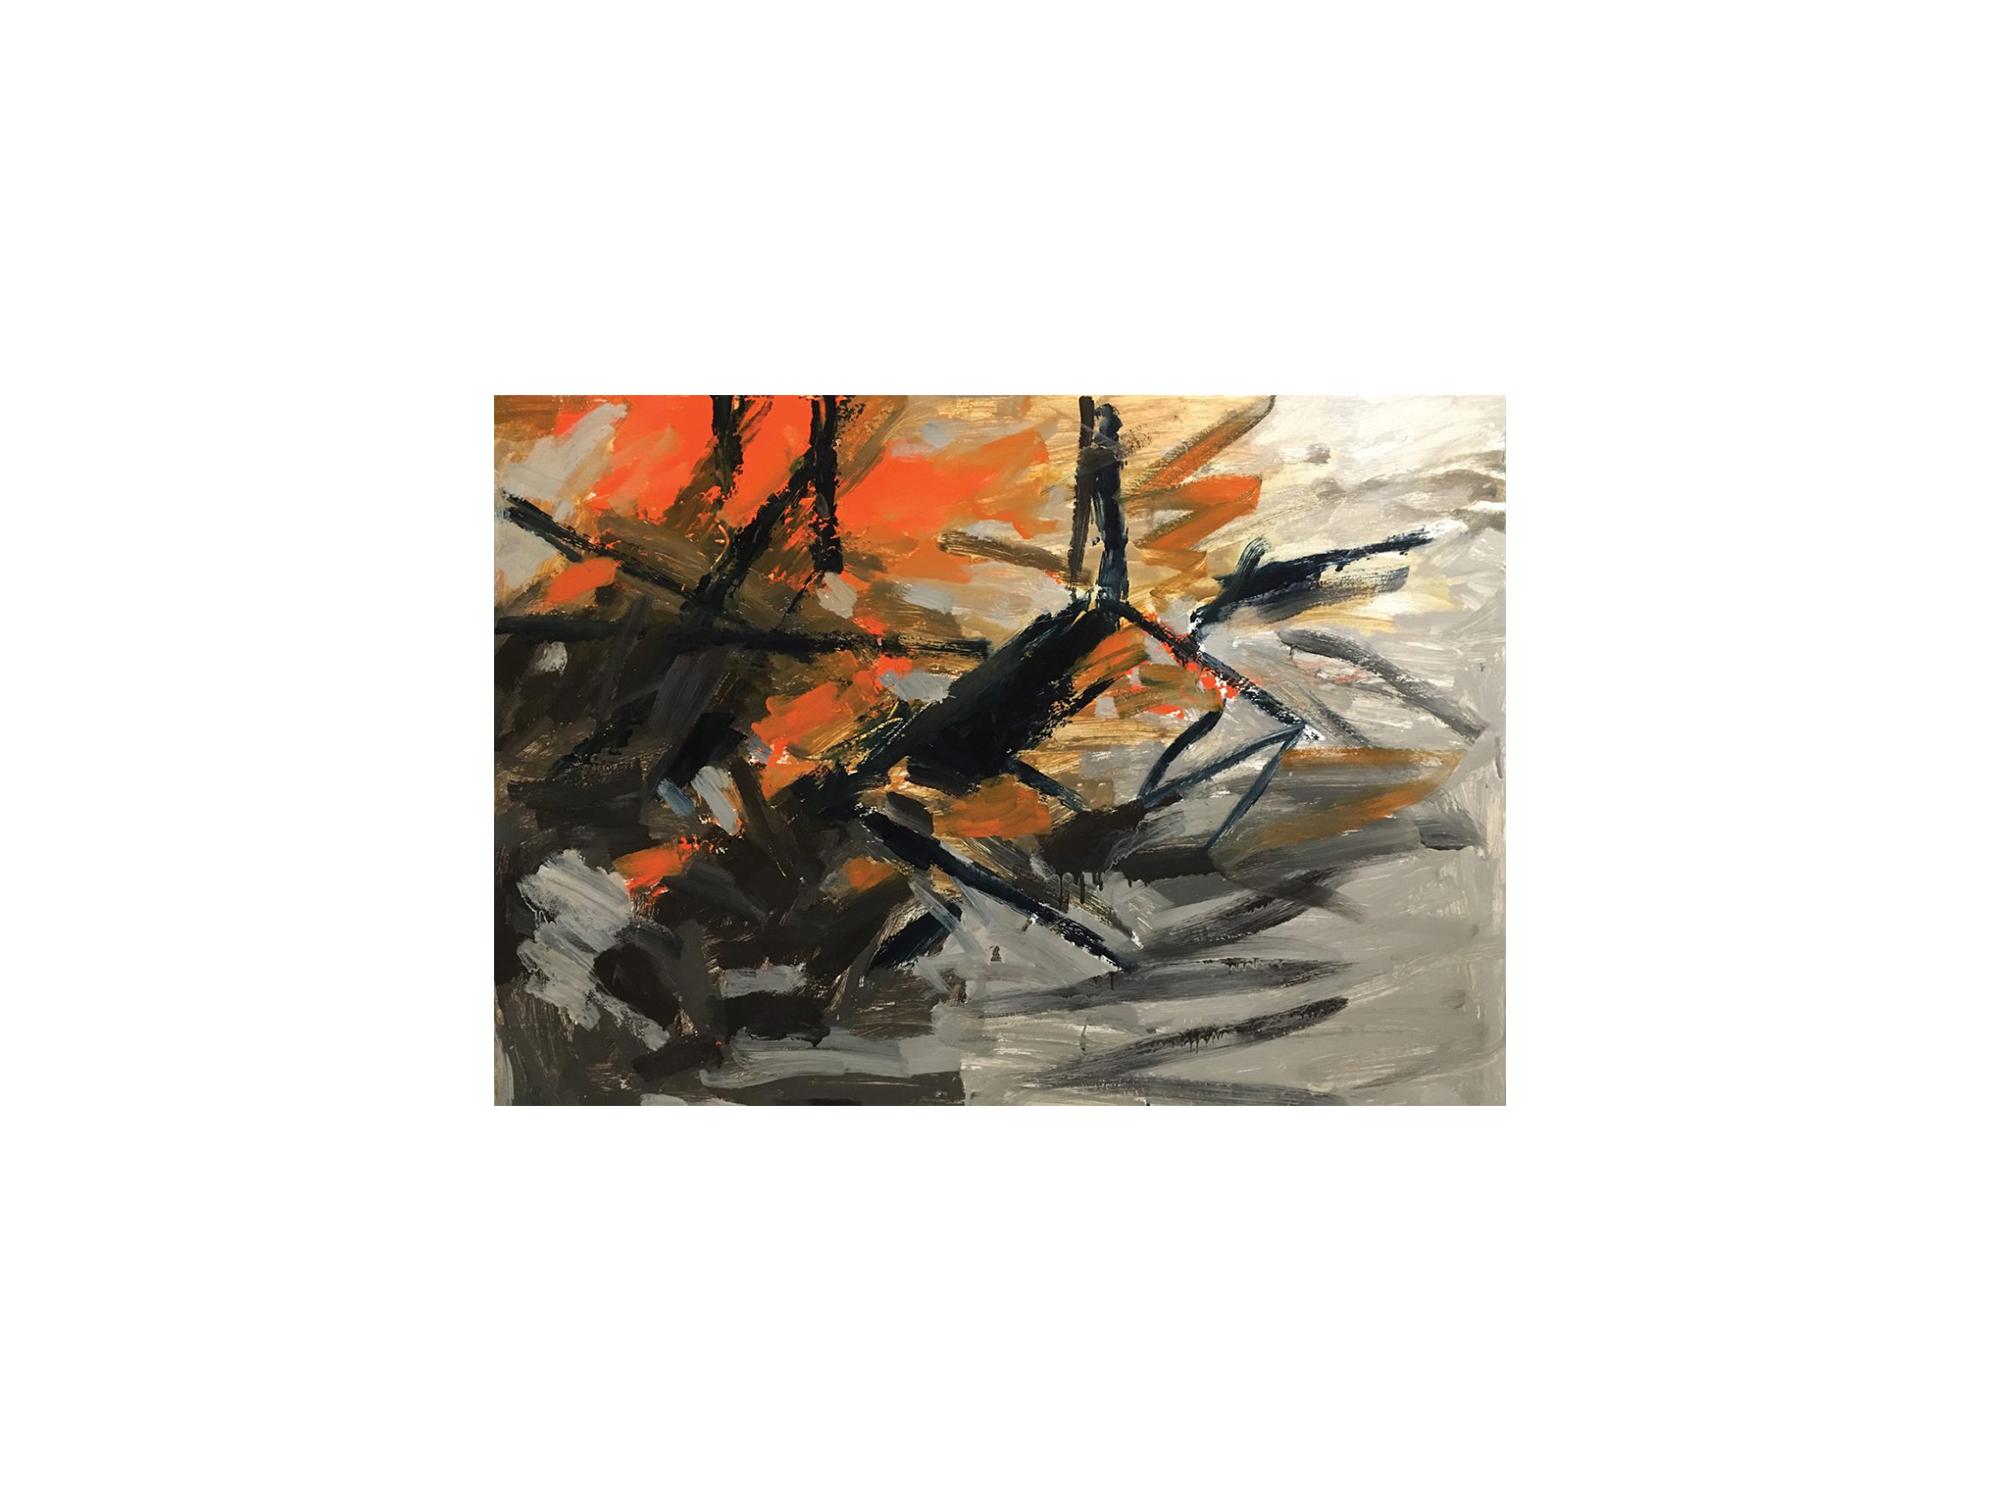 James Clayden   Site , 2016 enamel on board 66.5 x 93cm   ARTIST BIO